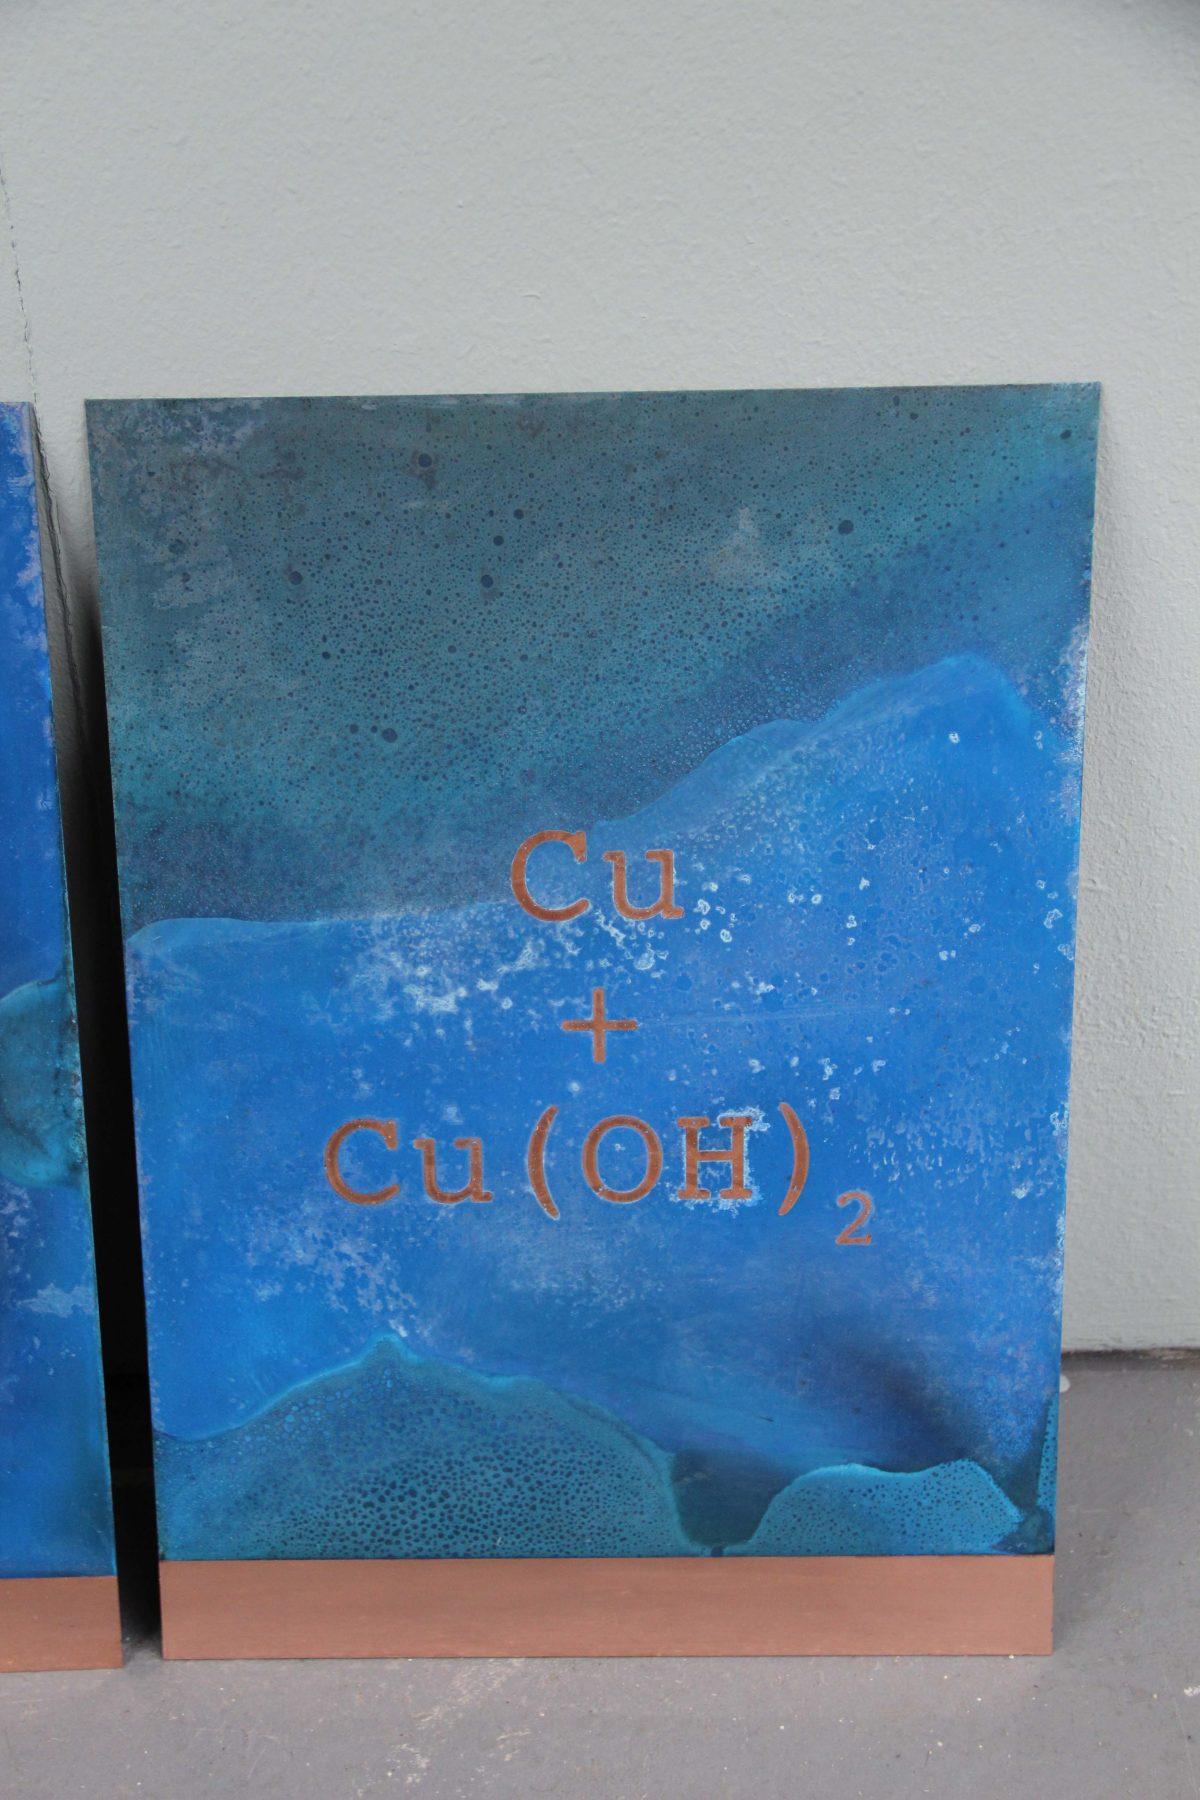 Truecolors Panel Lex Pott koper oxidatie Gimmii shop -foto Gimmii